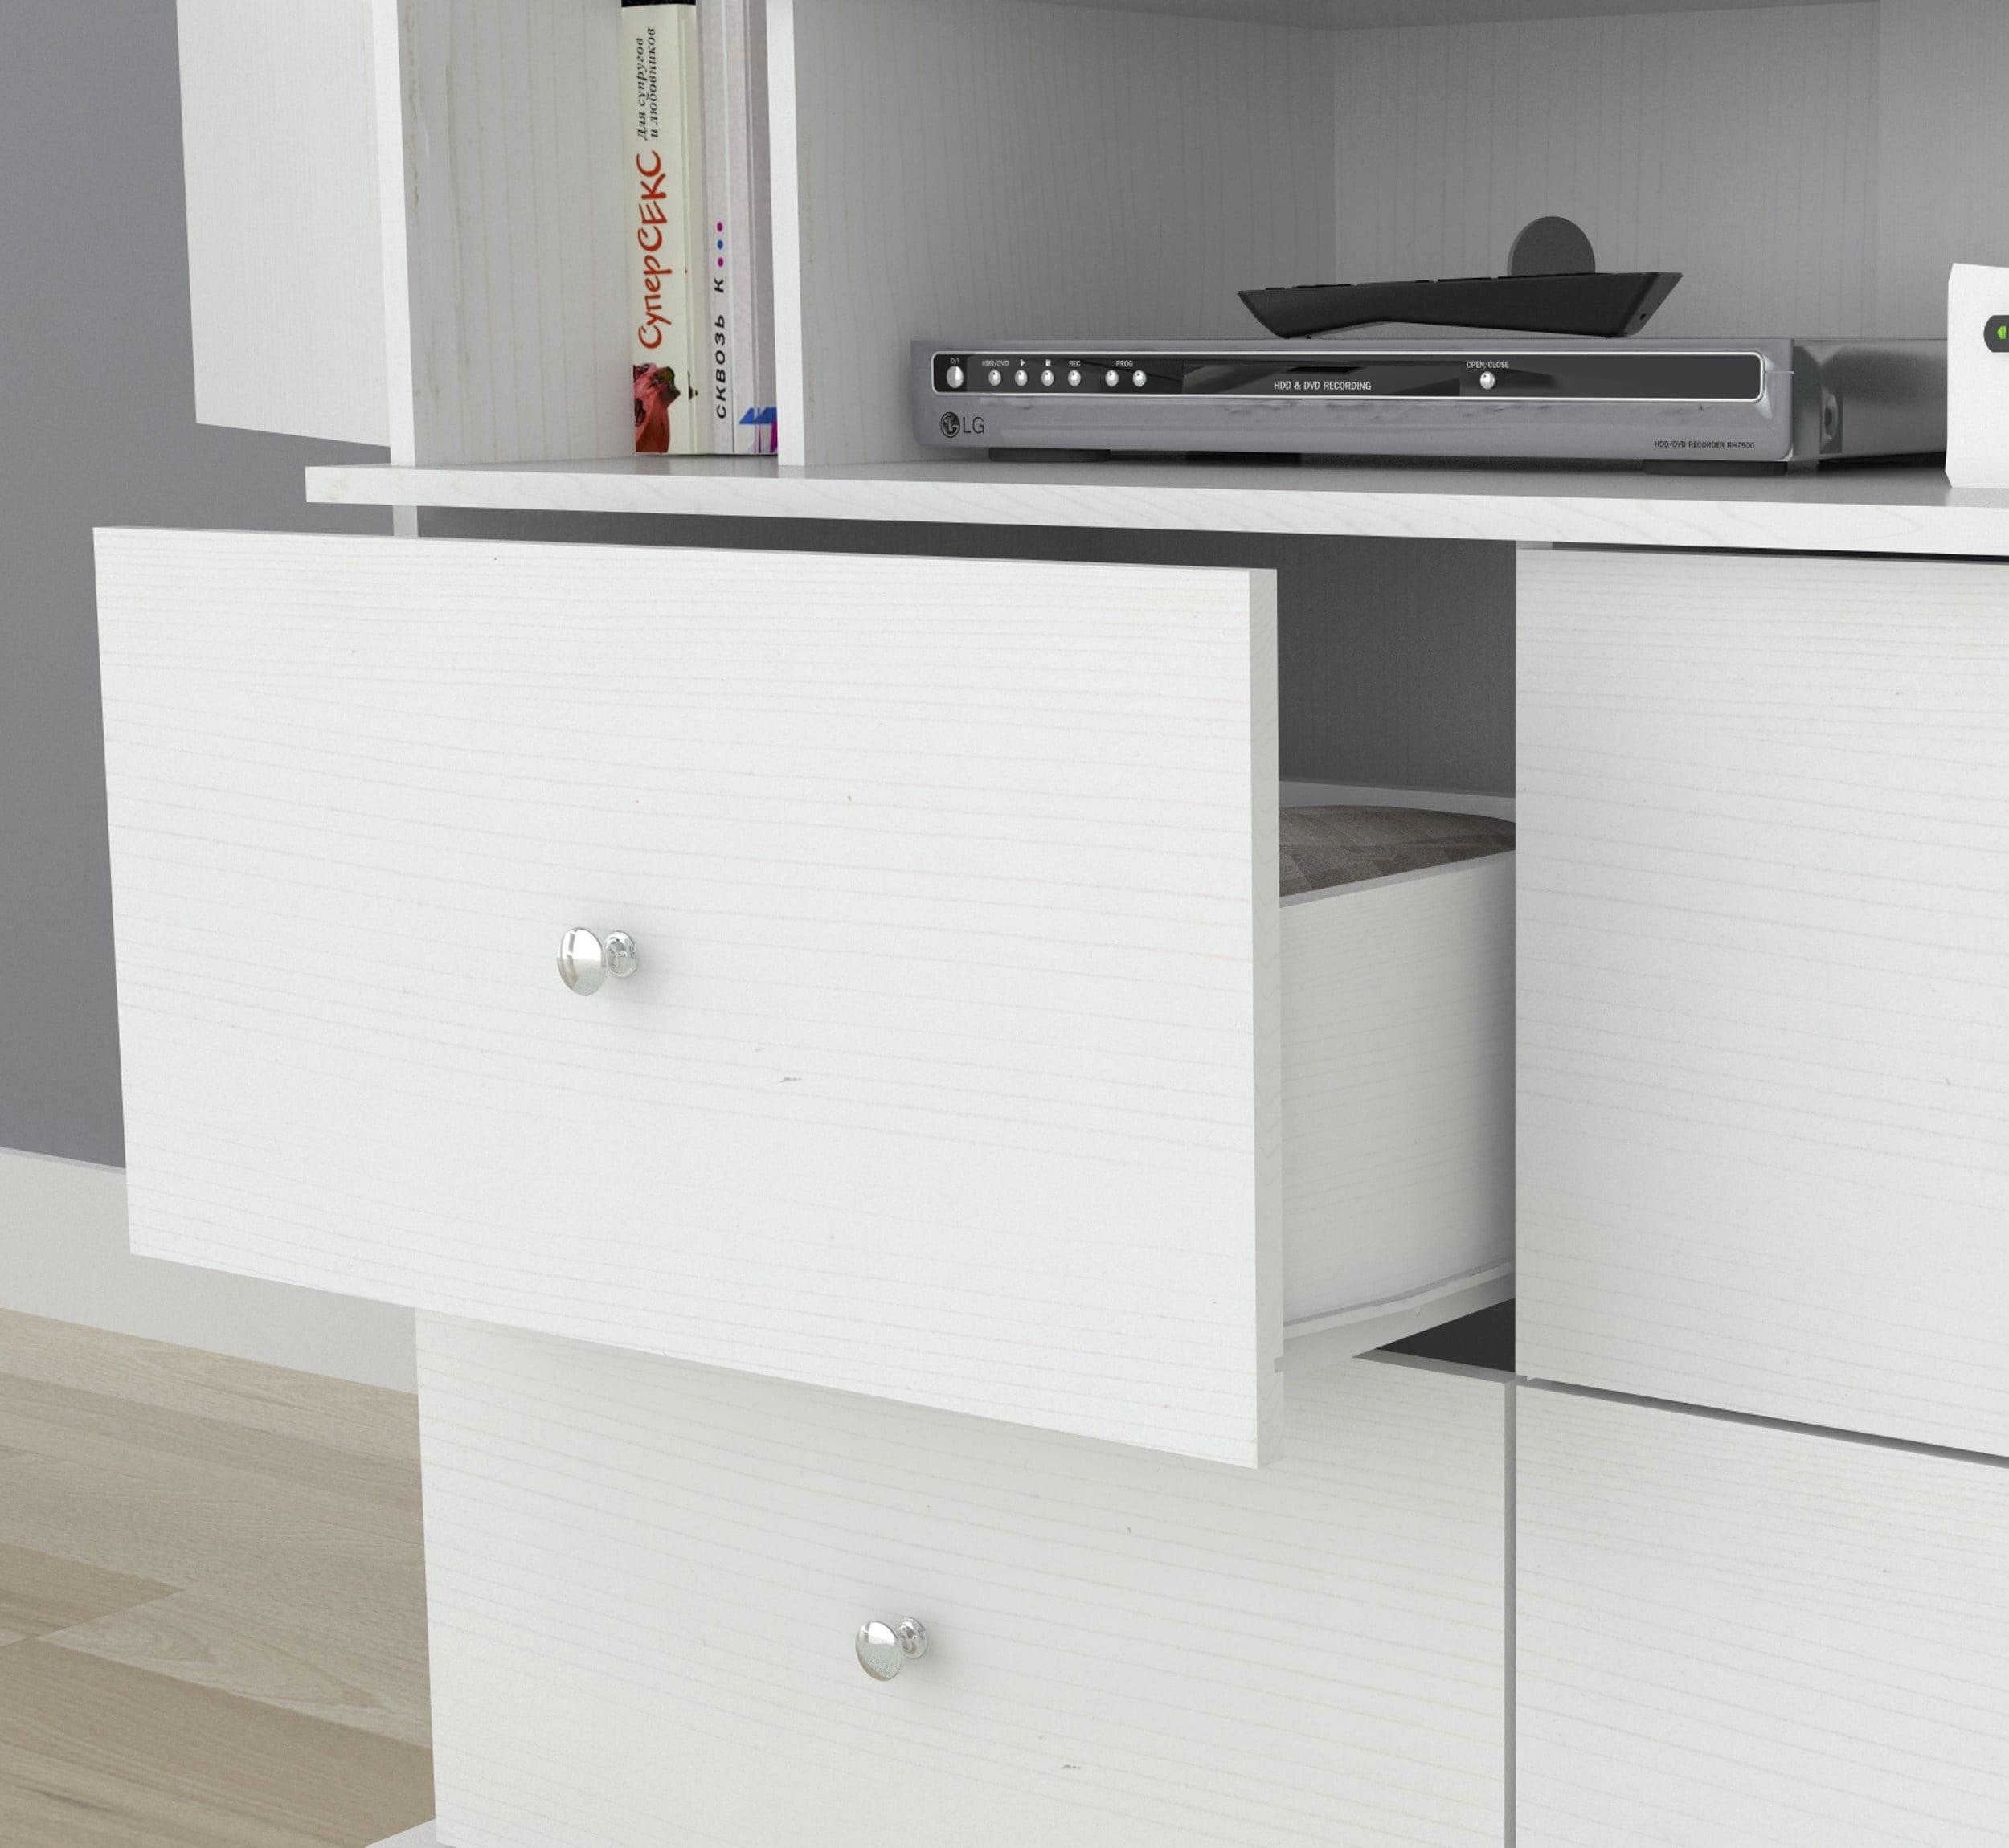 Inval Modern Laricina-white Armoire  AV Video Combo Cabinet by Inval